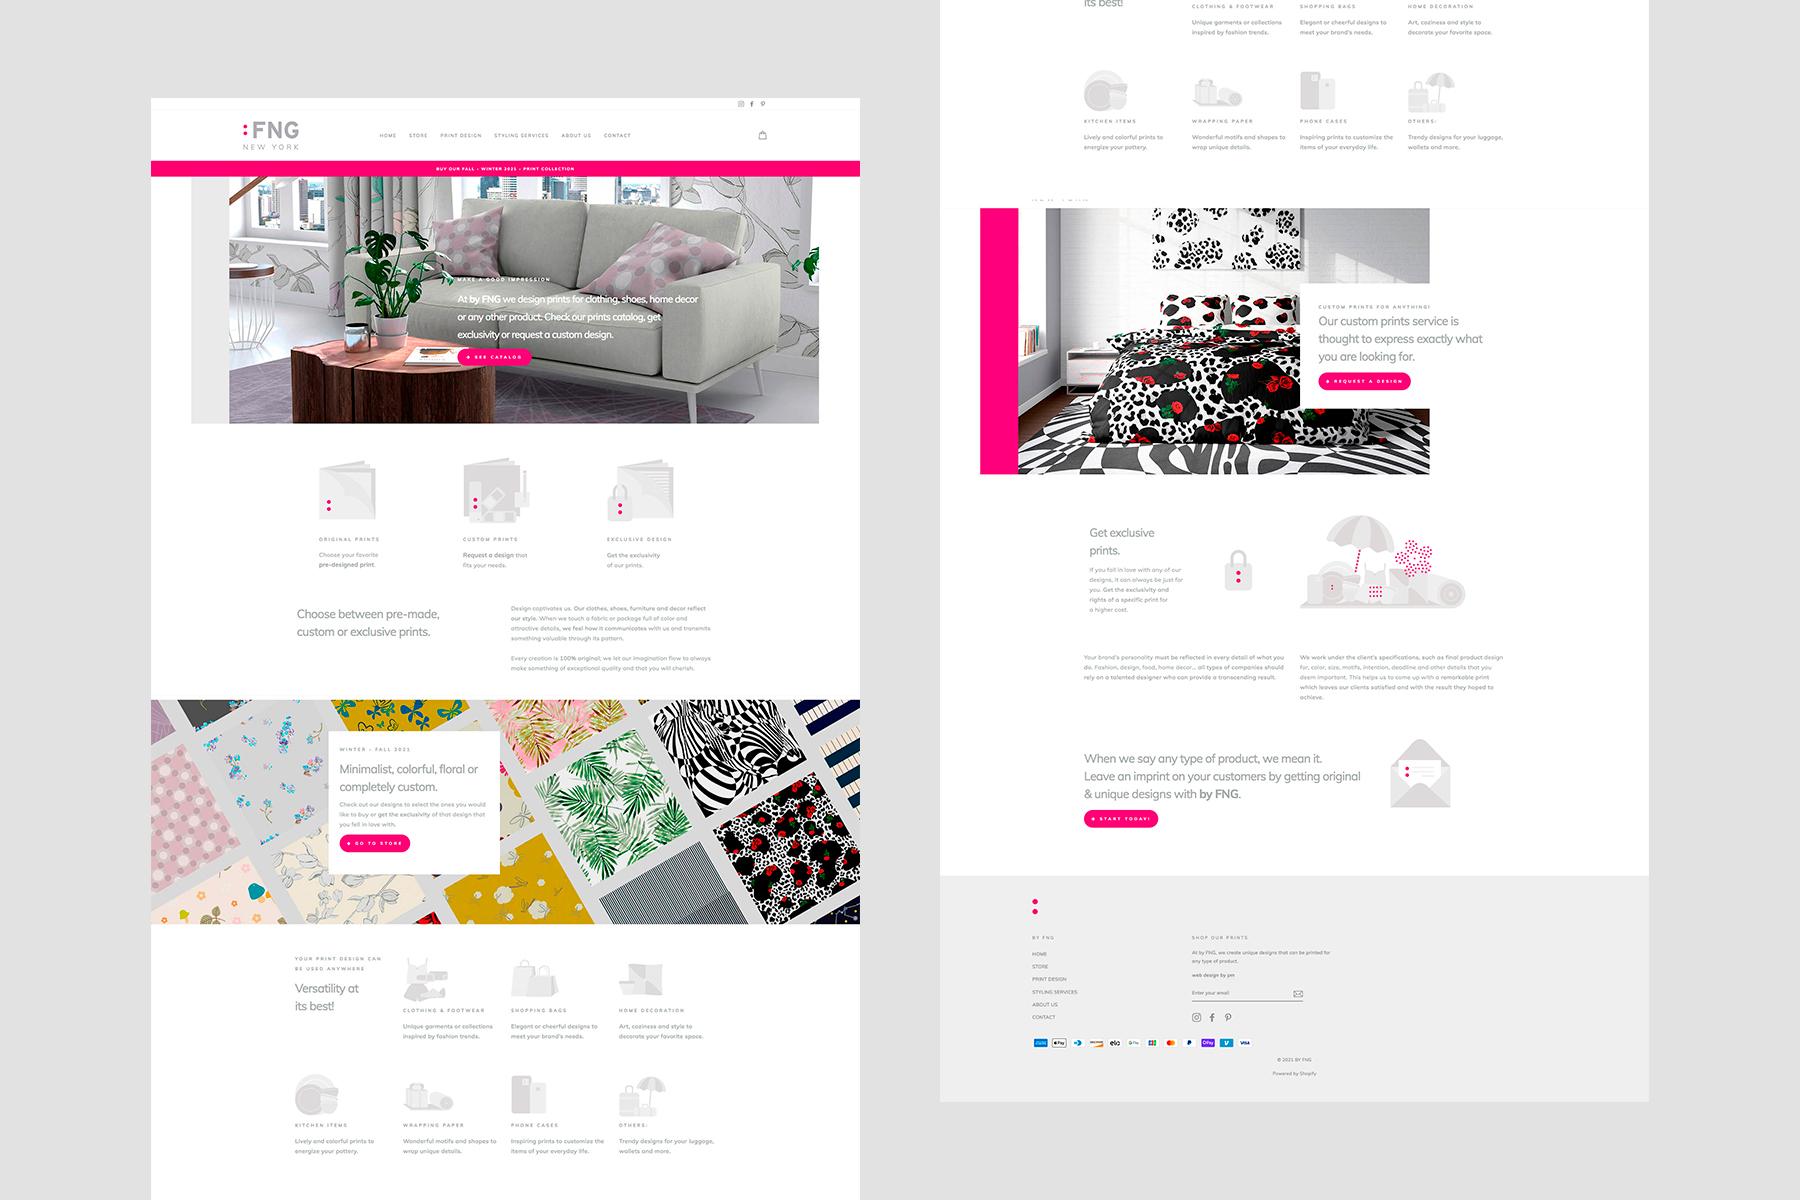 Custom Print Designer | NYC | byFNG.com